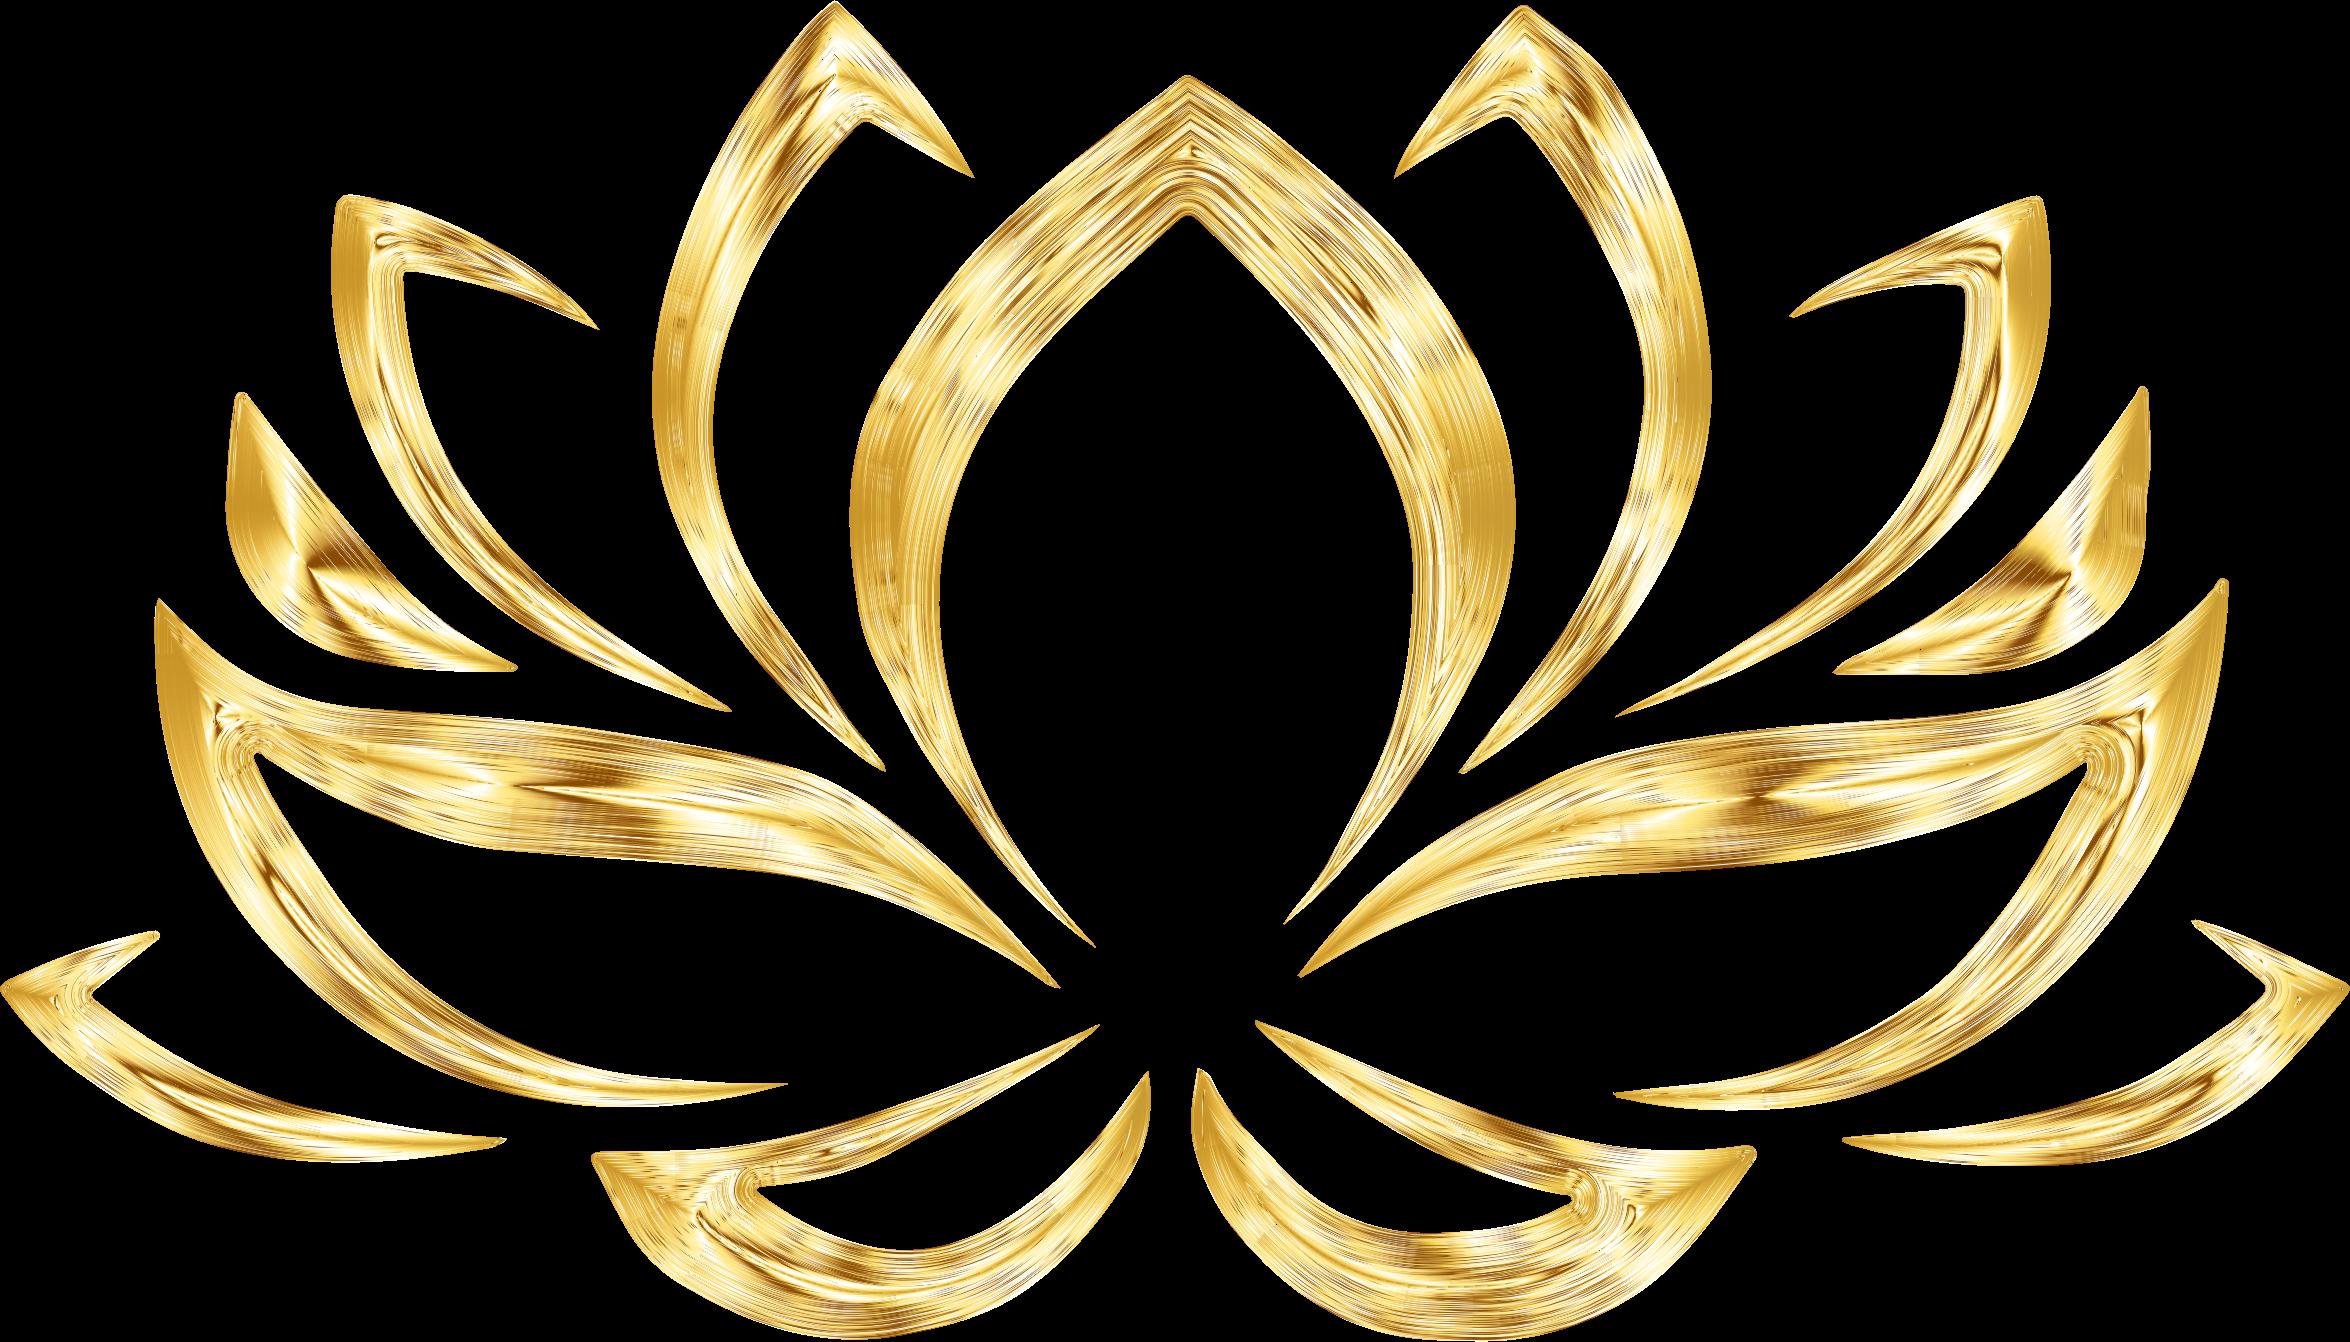 Lotus flower clipart no background svg transparent library Clipart - Aurumized Lotus Flower No Background svg transparent library